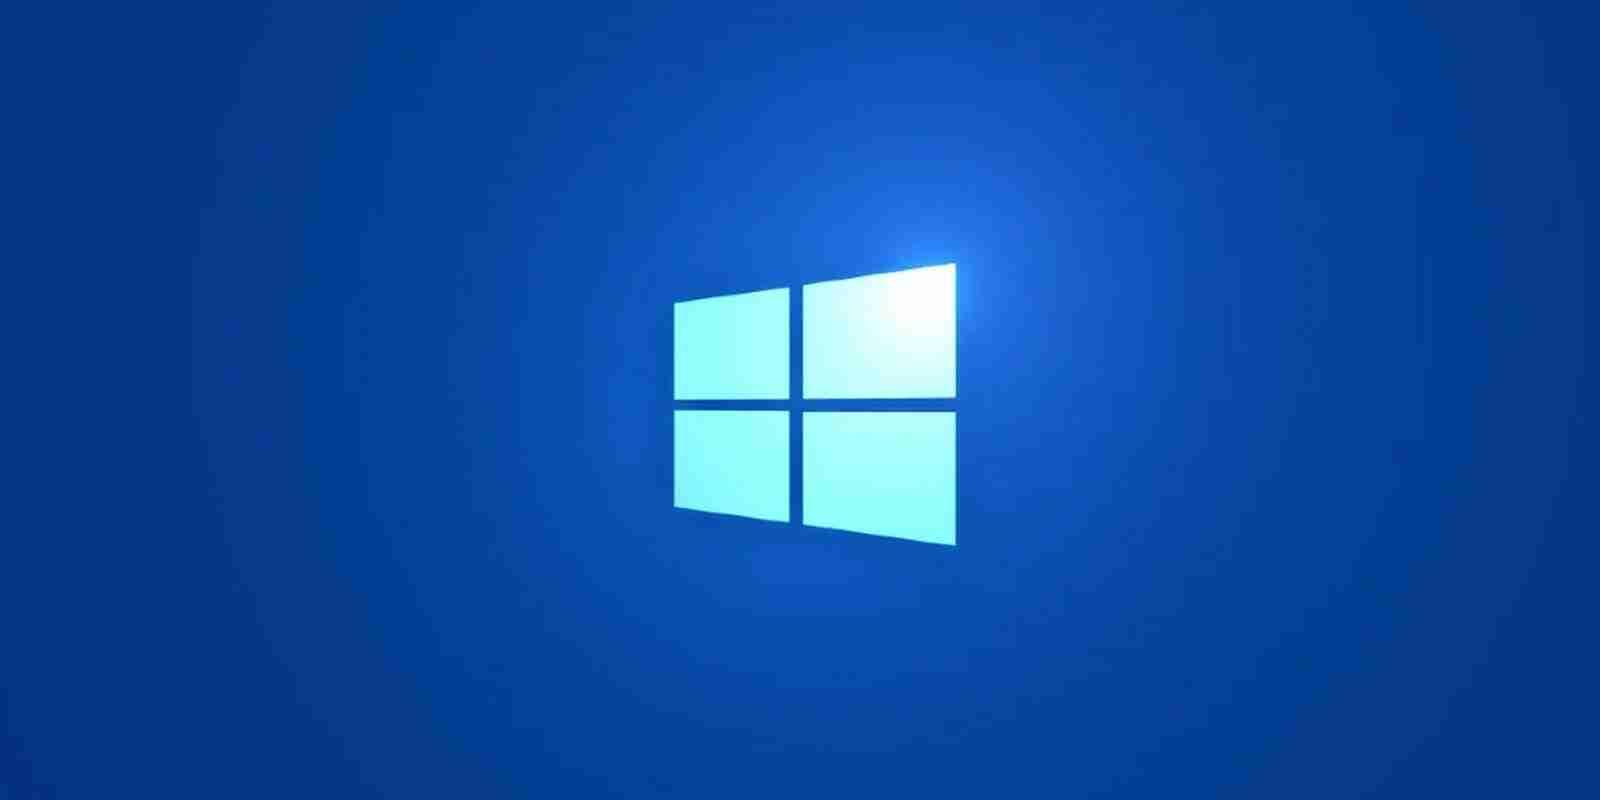 Windows 10 KB5003698 Update Fixes VPN Bug, Blurry Text Issues